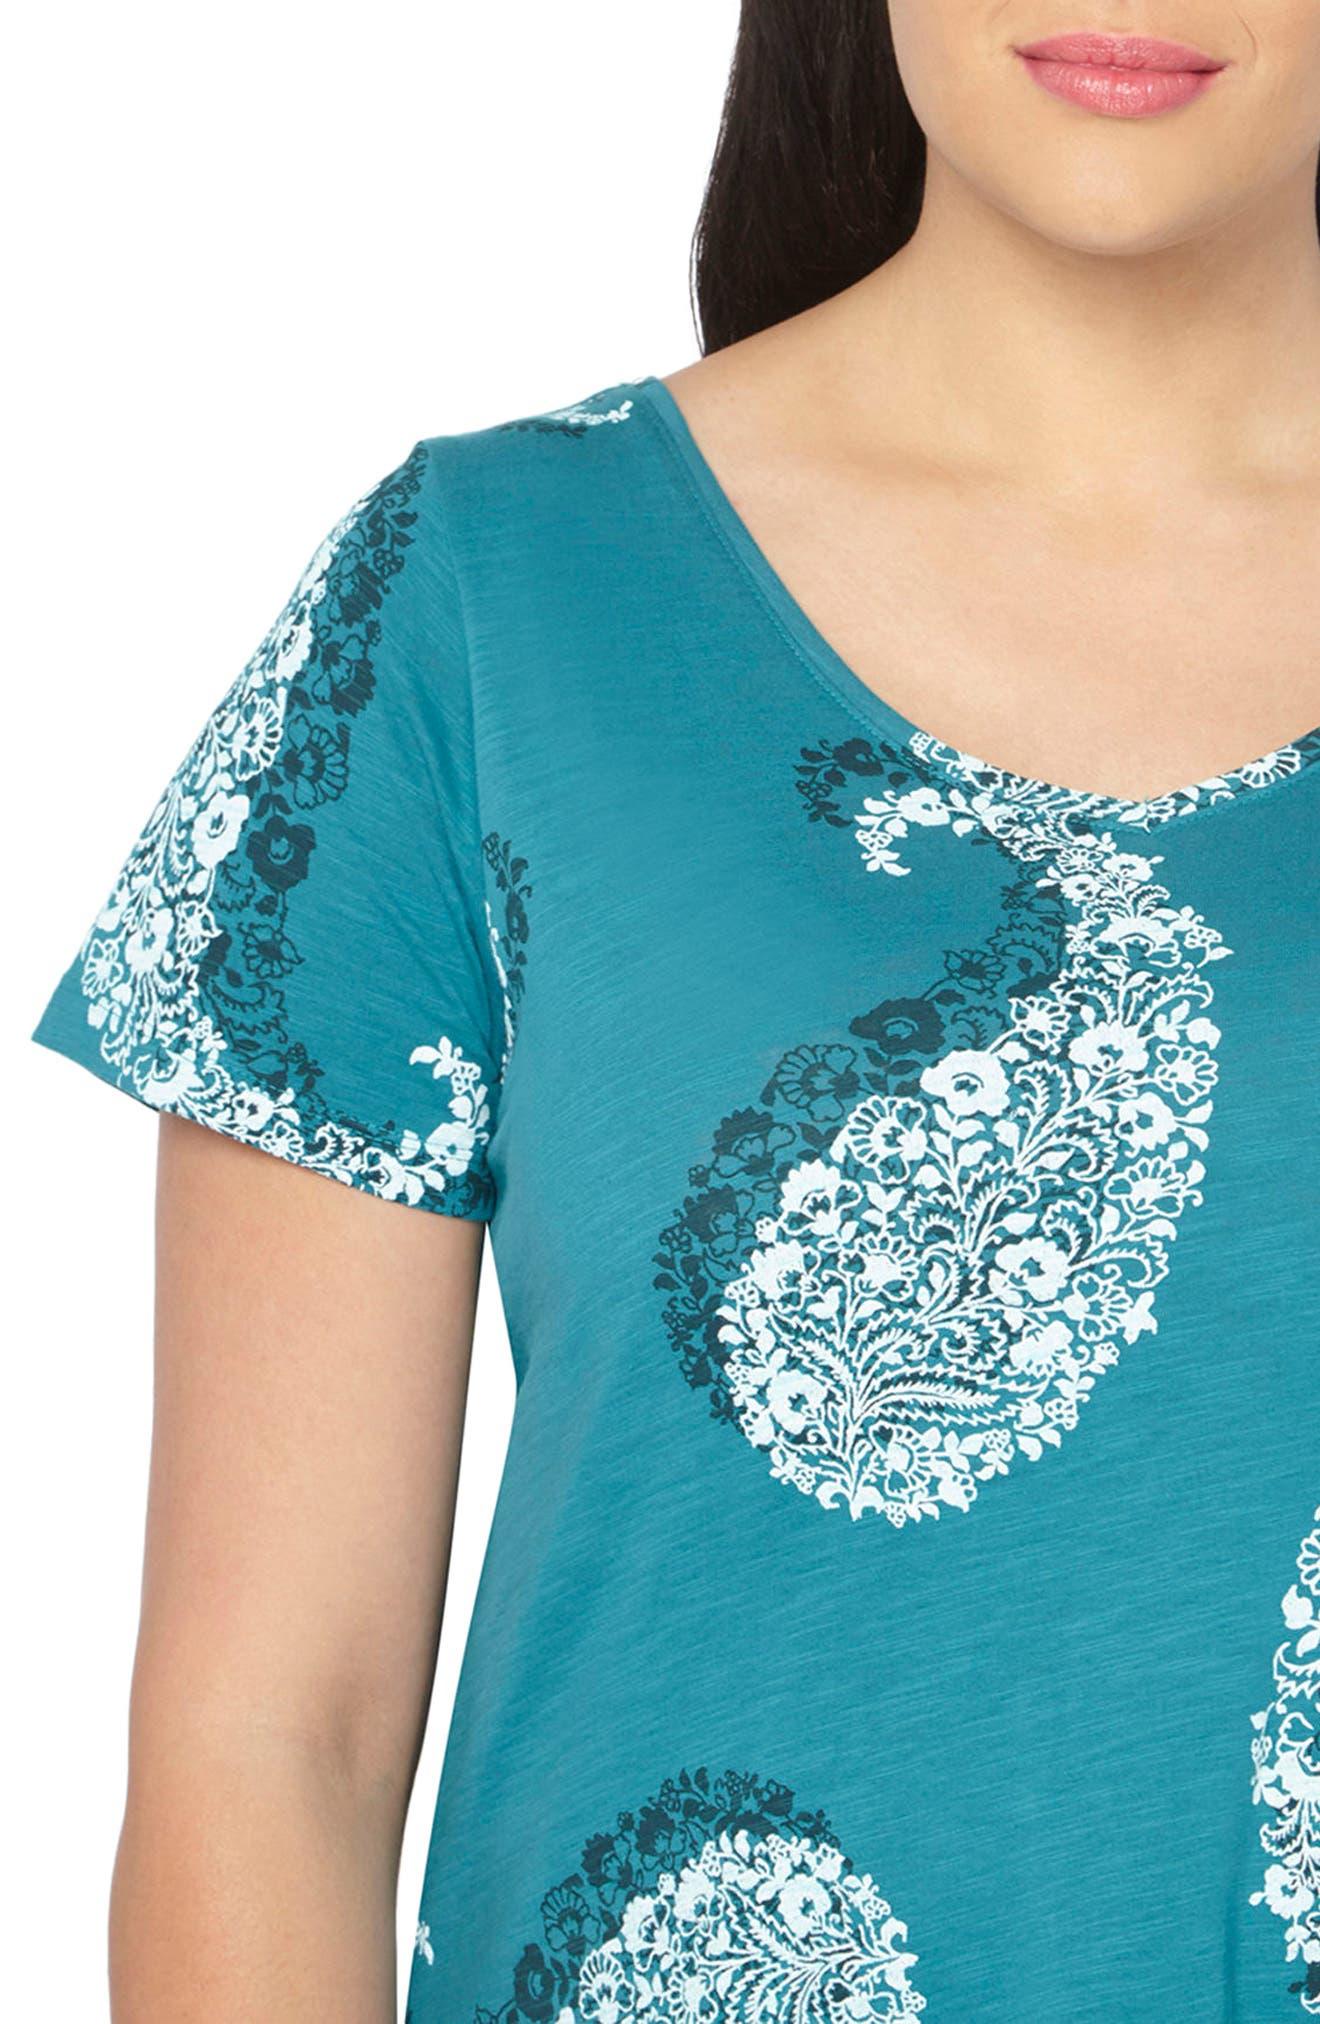 Evan Paisley Short Sleeve Shirt,                             Alternate thumbnail 3, color,                             401